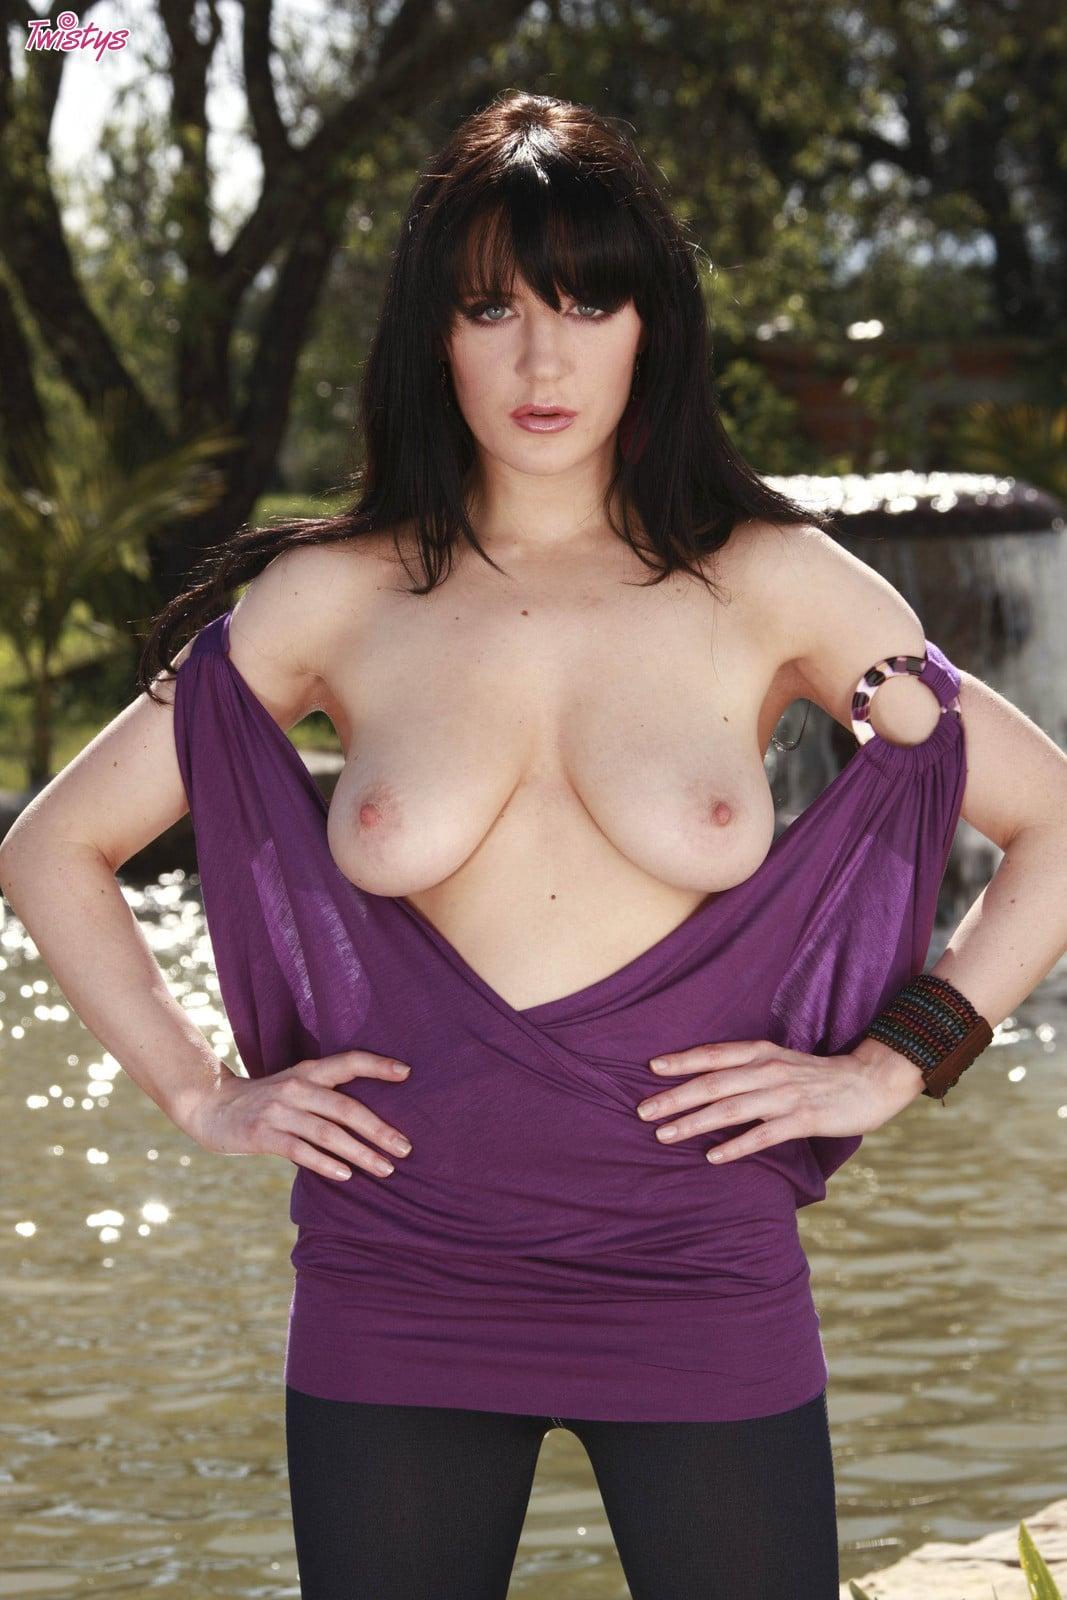 Samantha Bentley sliding off purple dress by the pool